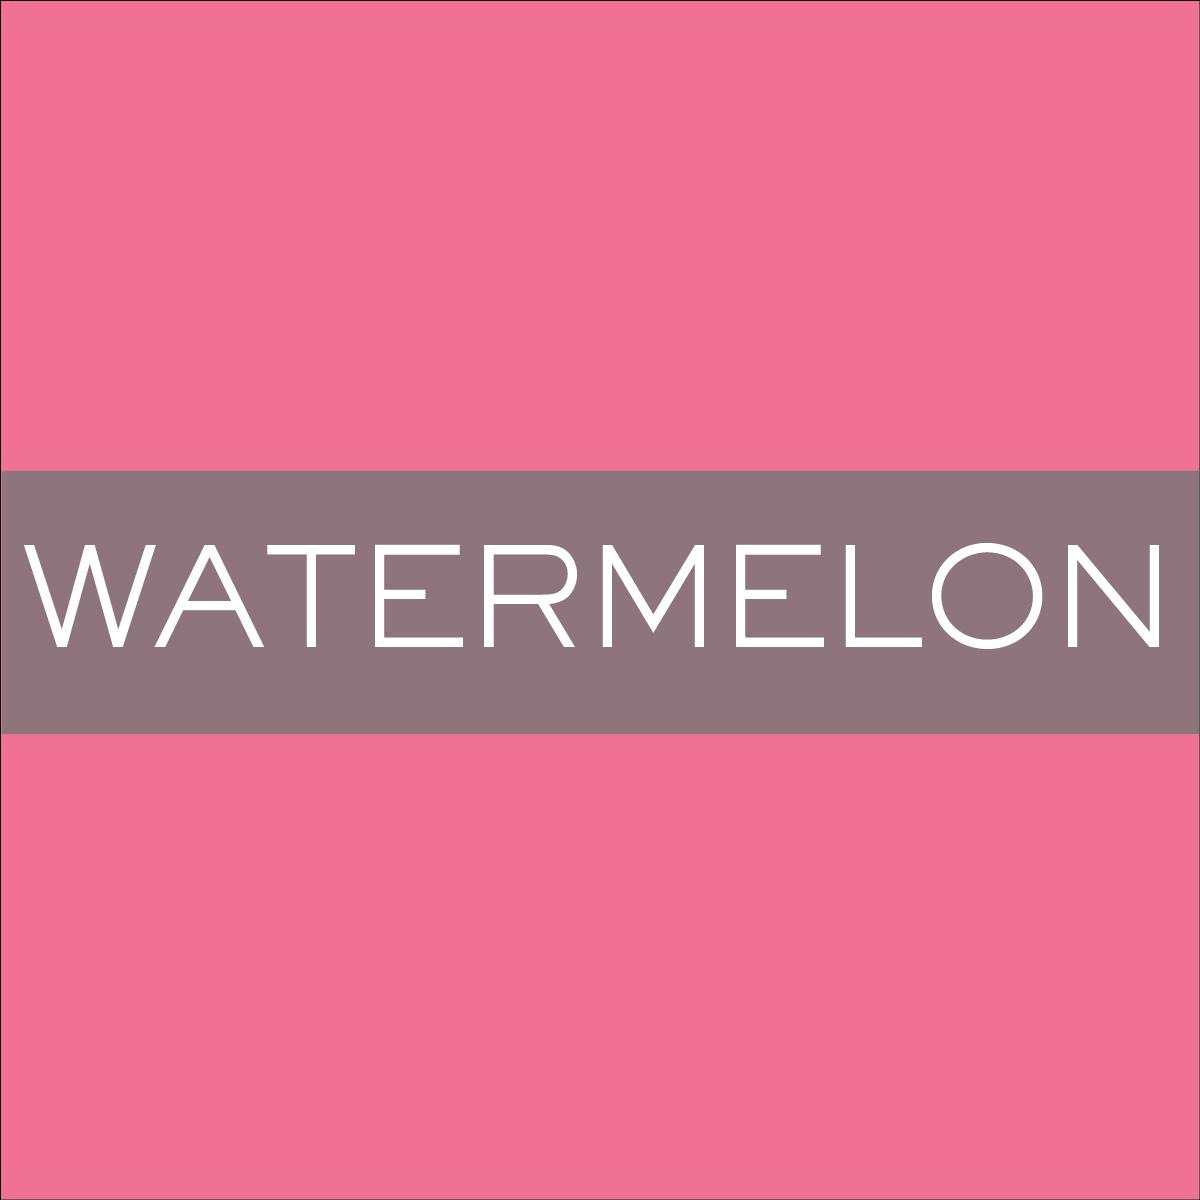 INK_Watermelon.jpg